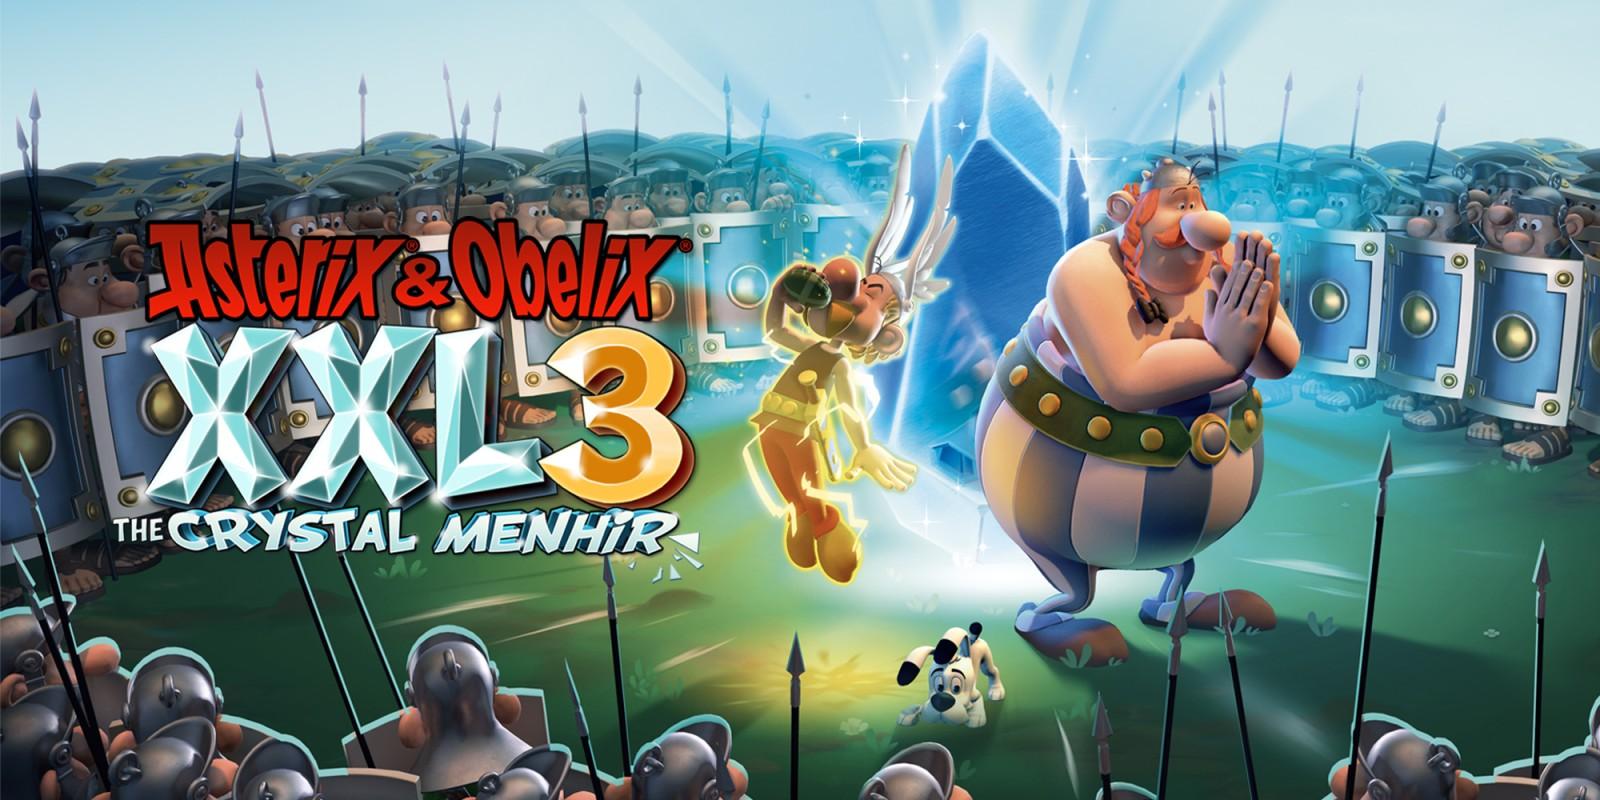 Jogos em formato físico da semana  – Astérix and Obélix XXL3: The Crystal Menhir, Zumba Burn it Up!, Bubble Bobble 4 Friends e mais